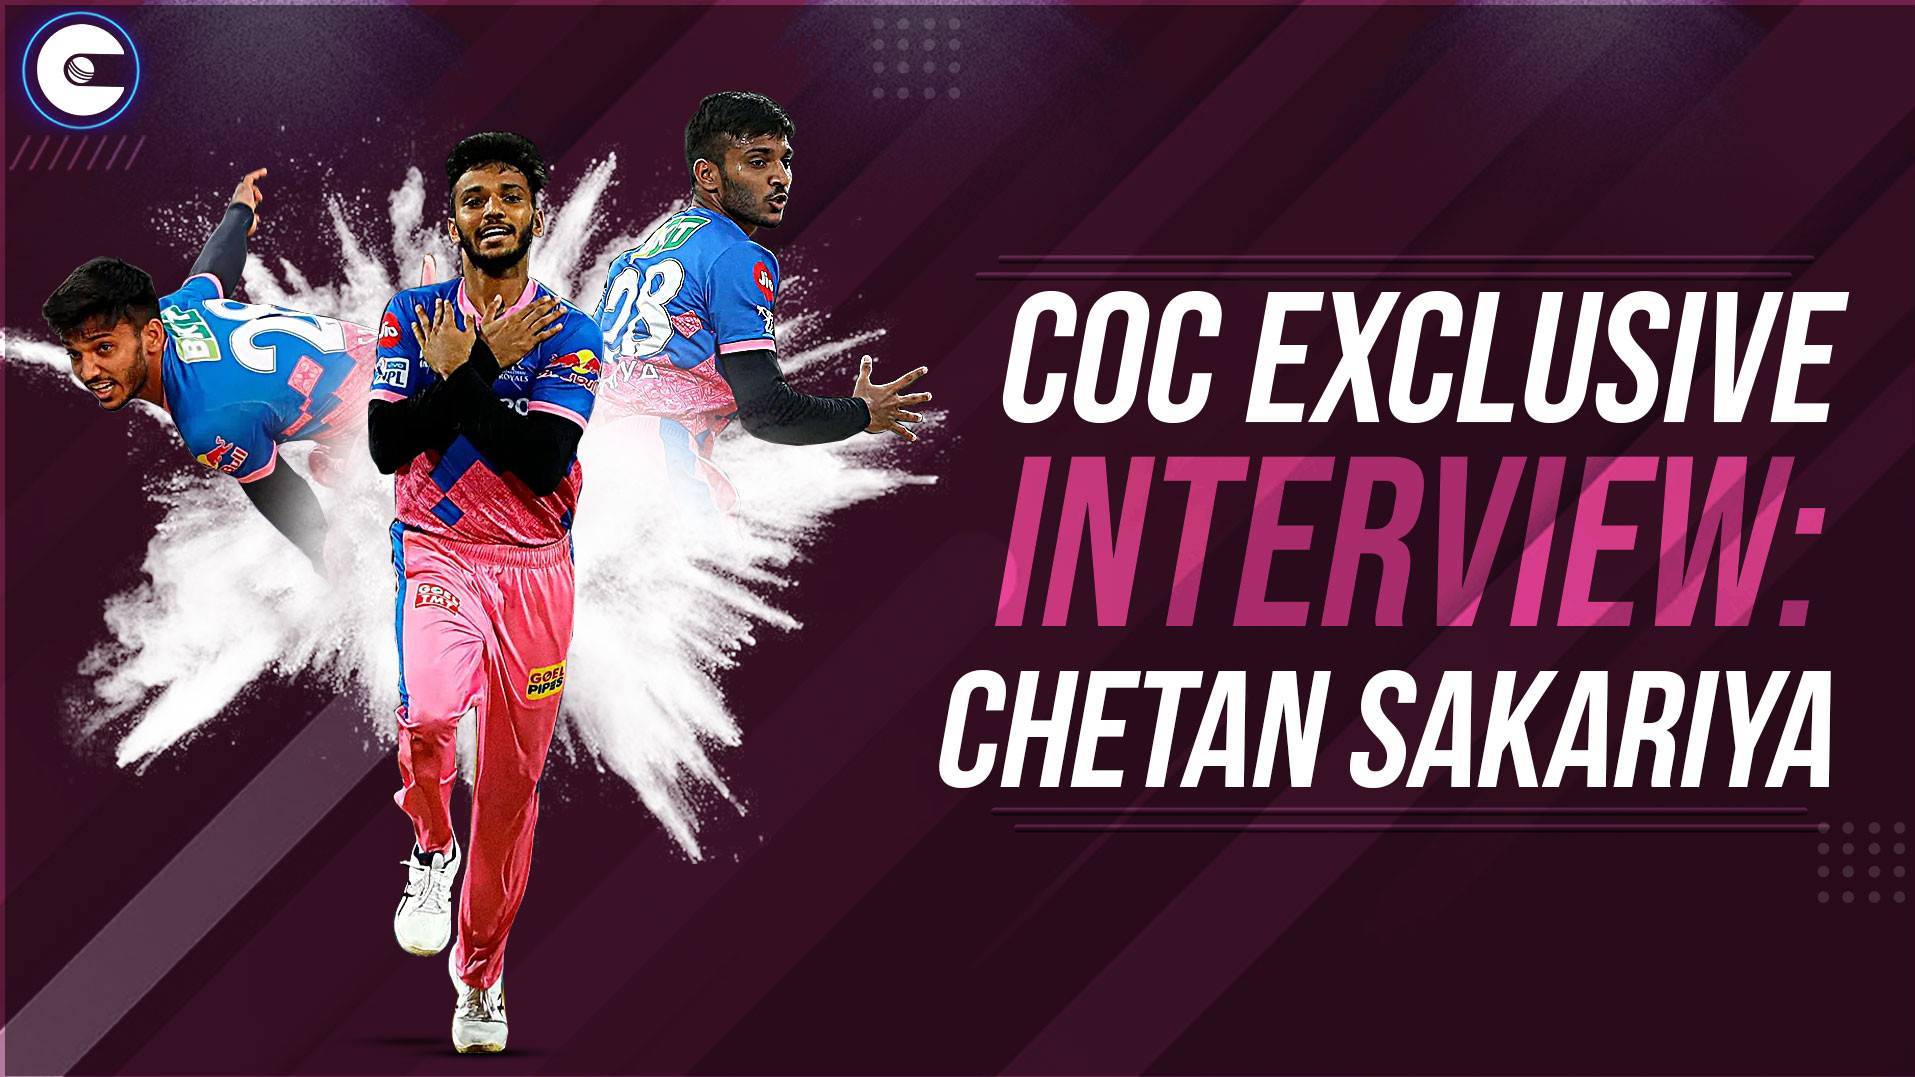 Exclusive: Circle of Cricket interview with Chetan Sakariya